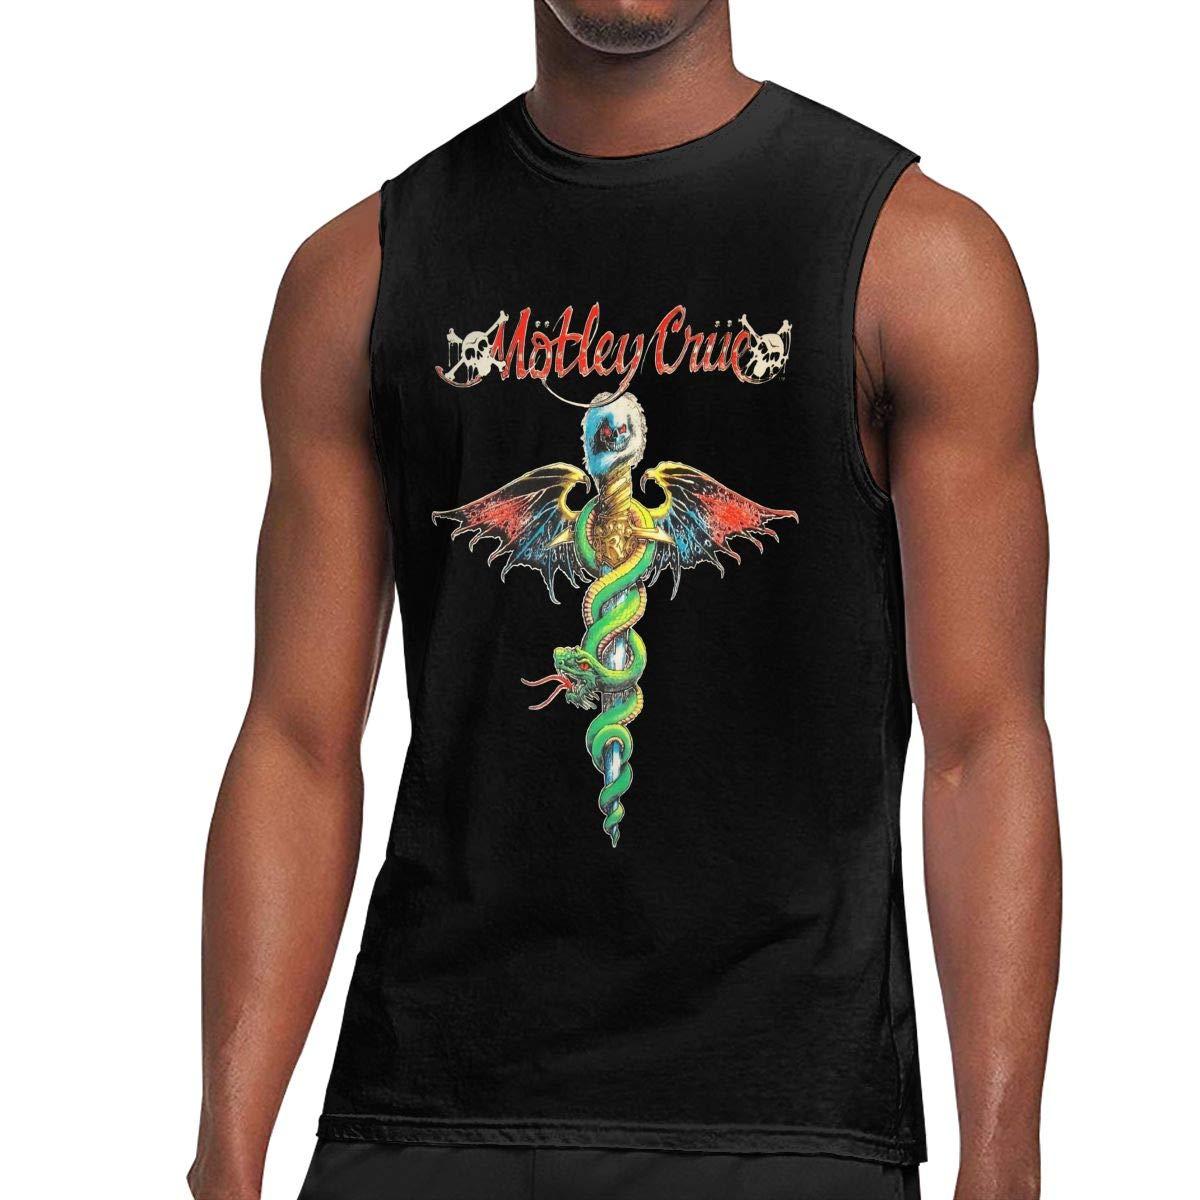 Crue T Shirt Man Ultra Tee Sleeveless T Shirt Fashion Top Tank Top Tee 4503